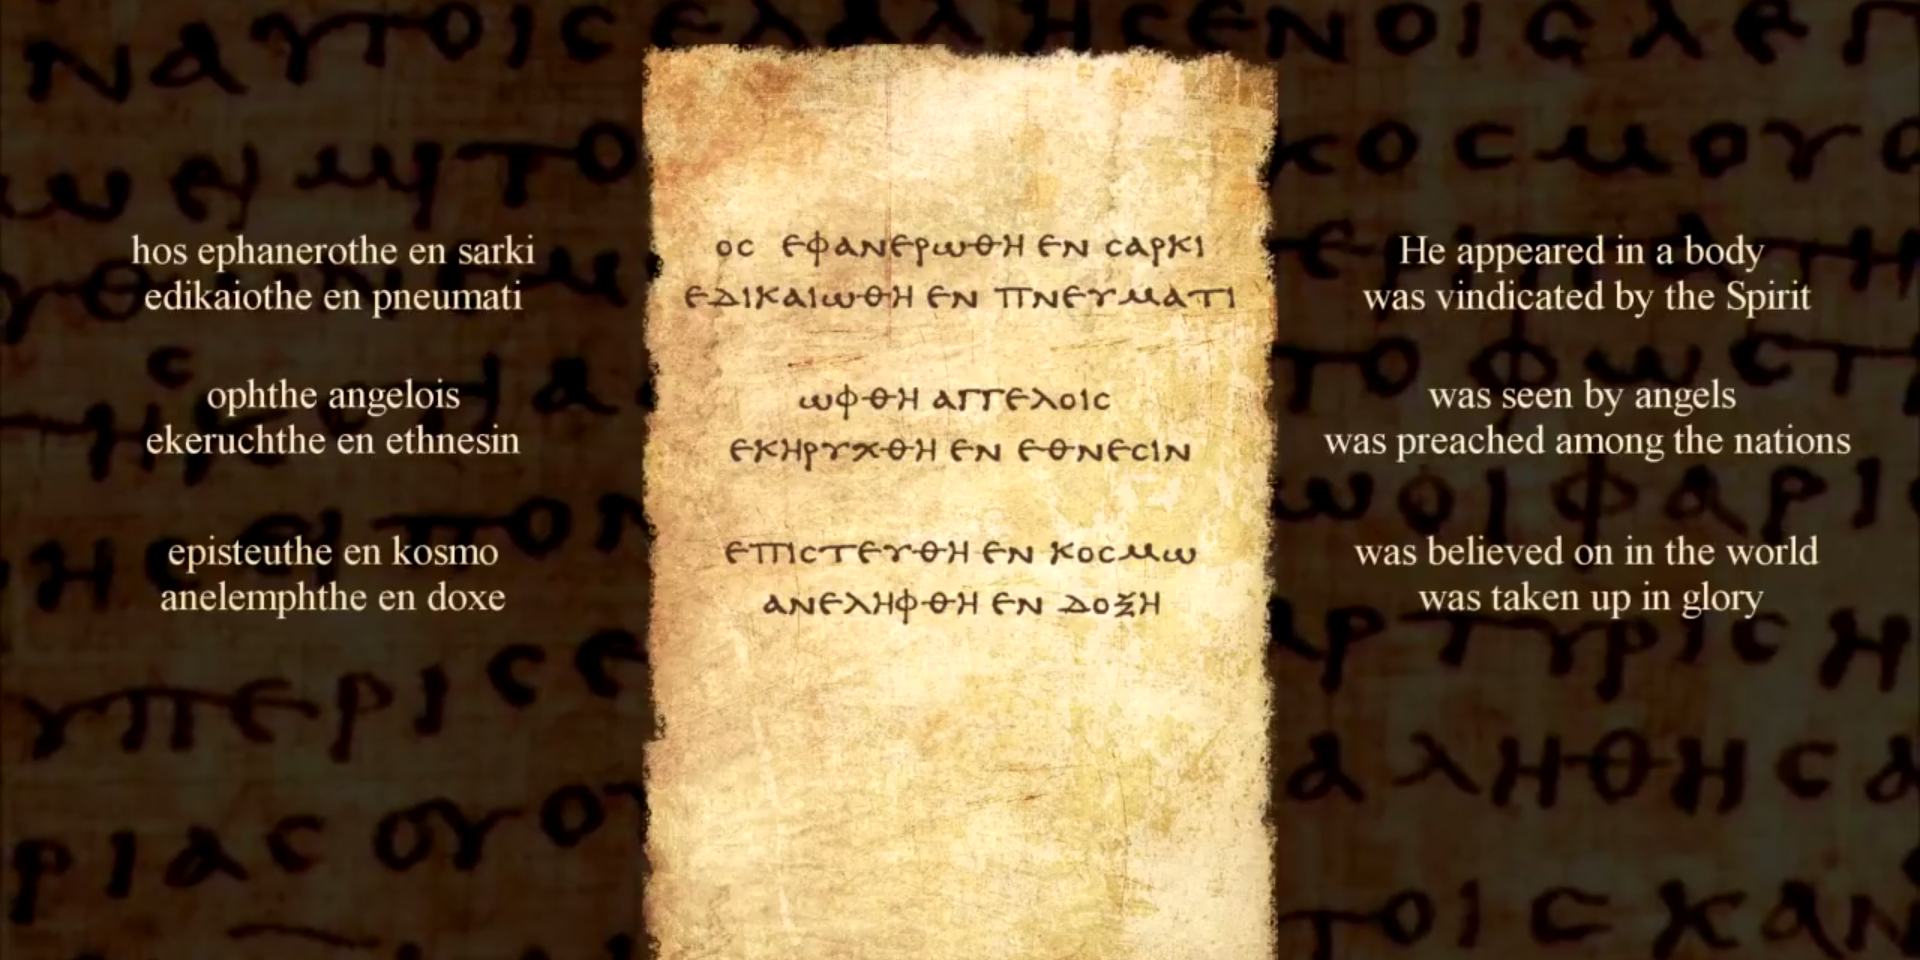 ANCIENT CHRISTIAN HYMN